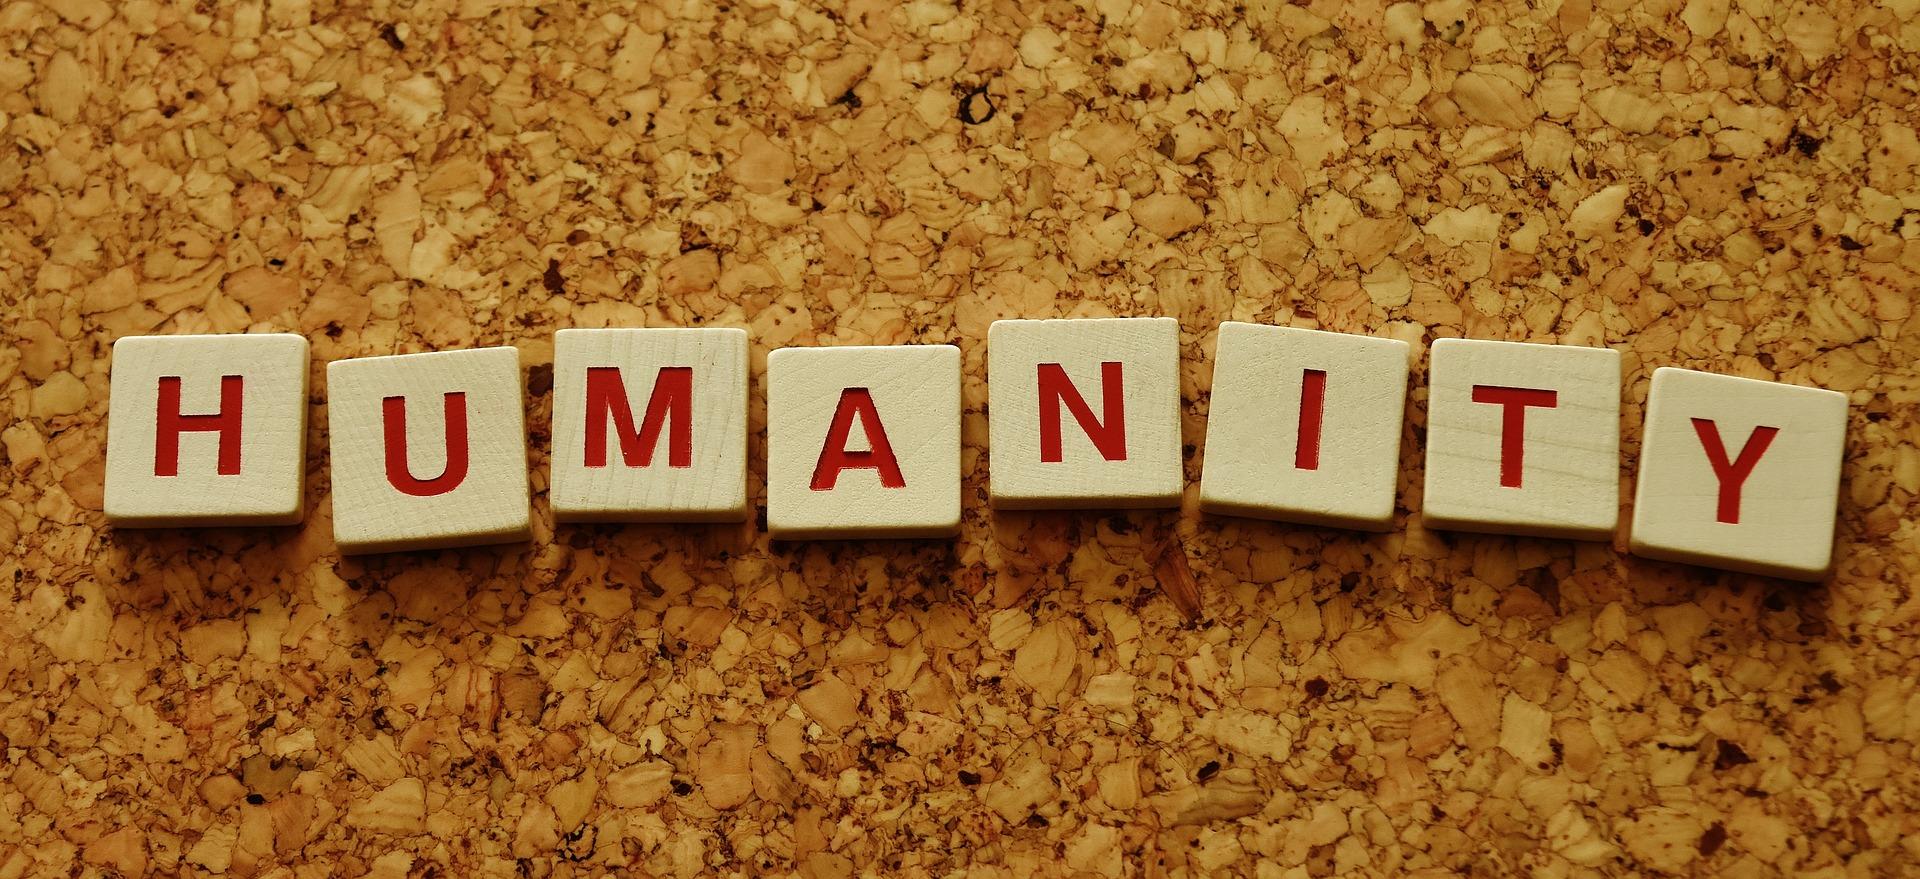 humanity-2045992_1920.jpg